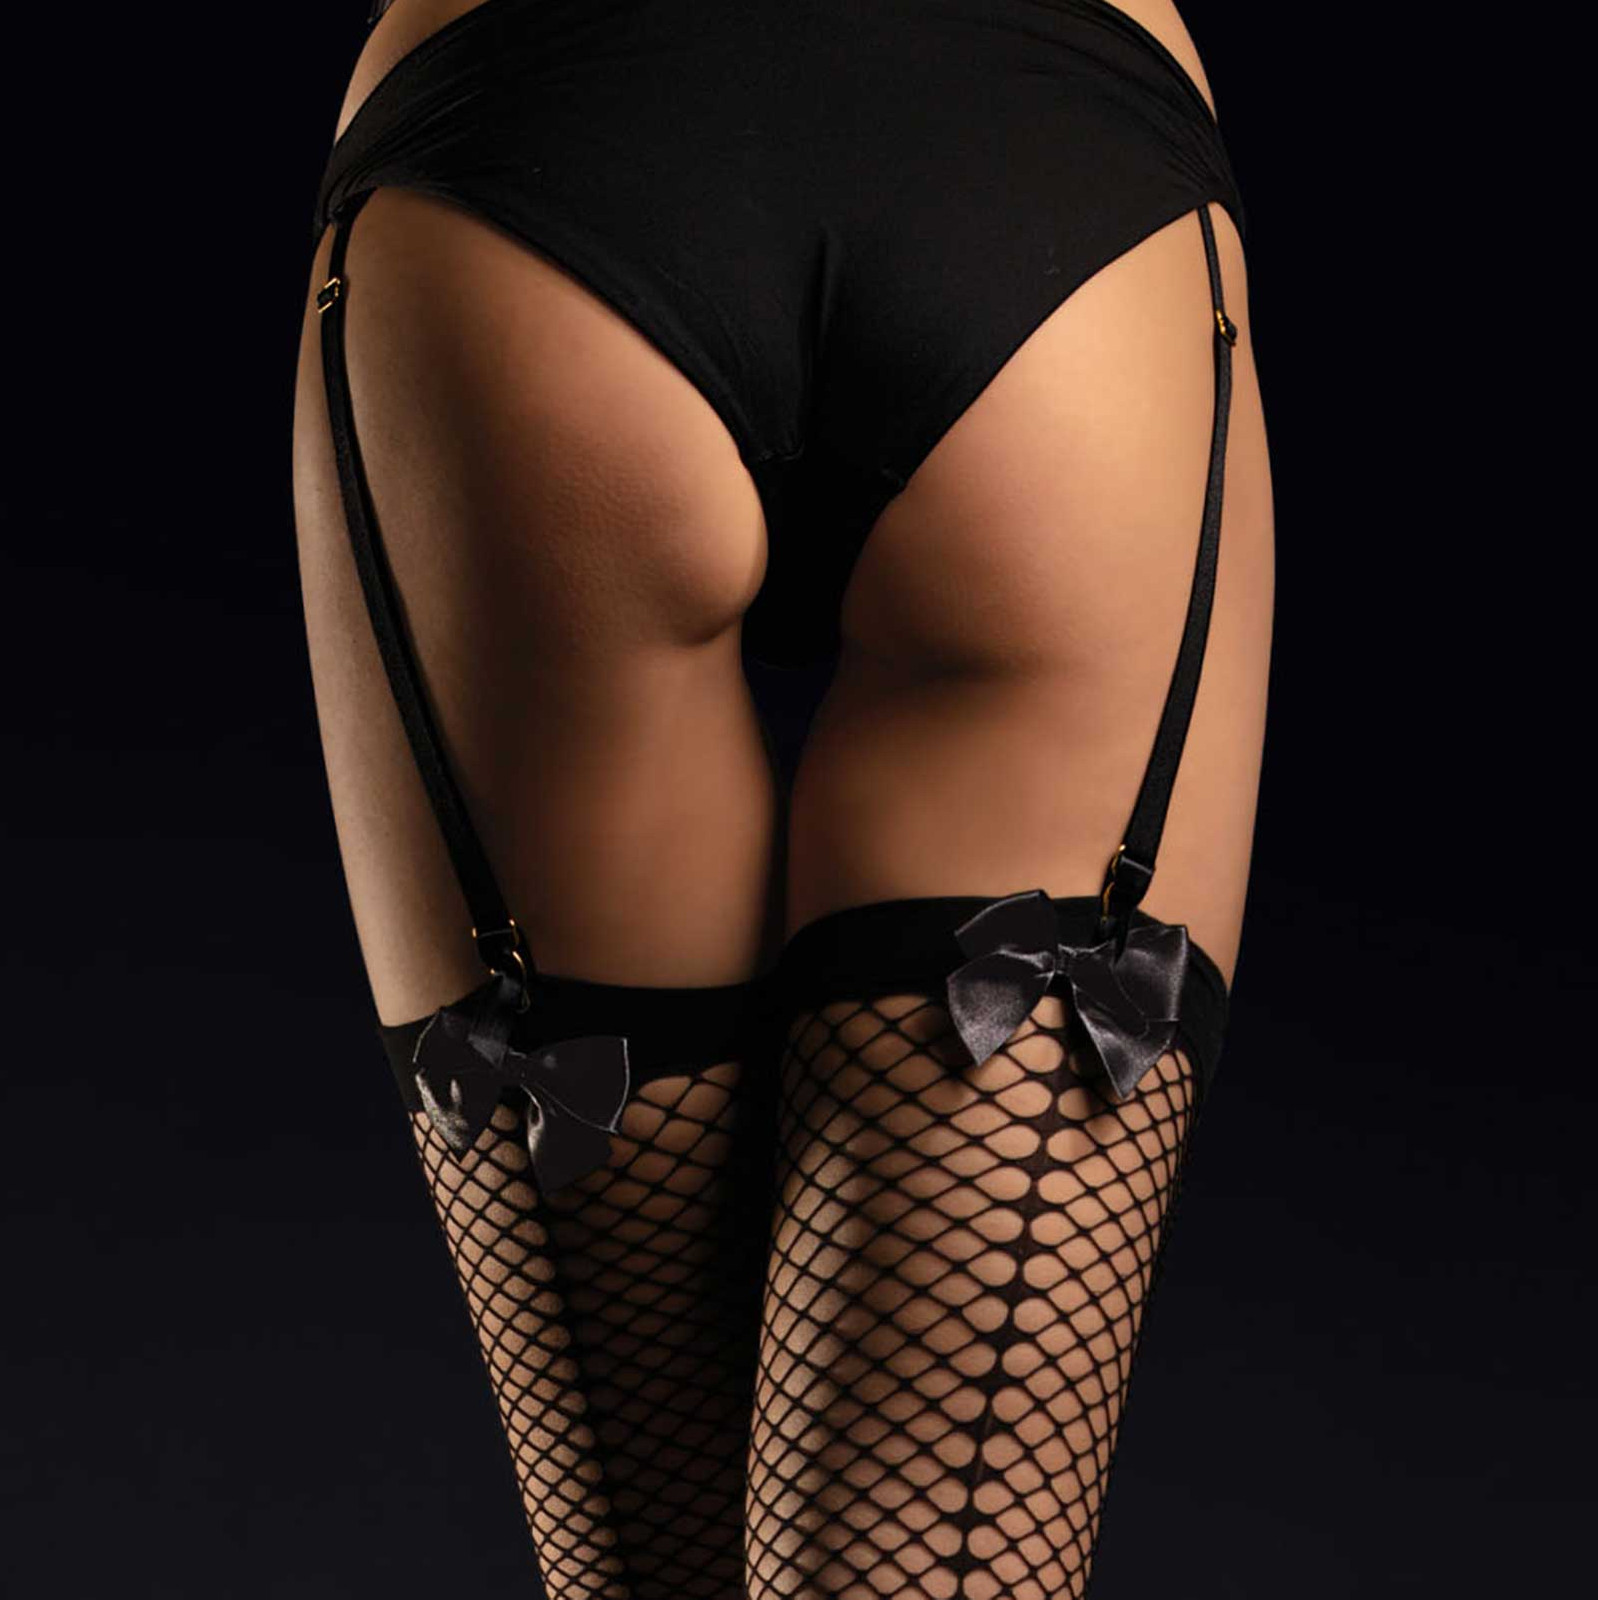 FIORE Satine Luxury Fishnet Stockings